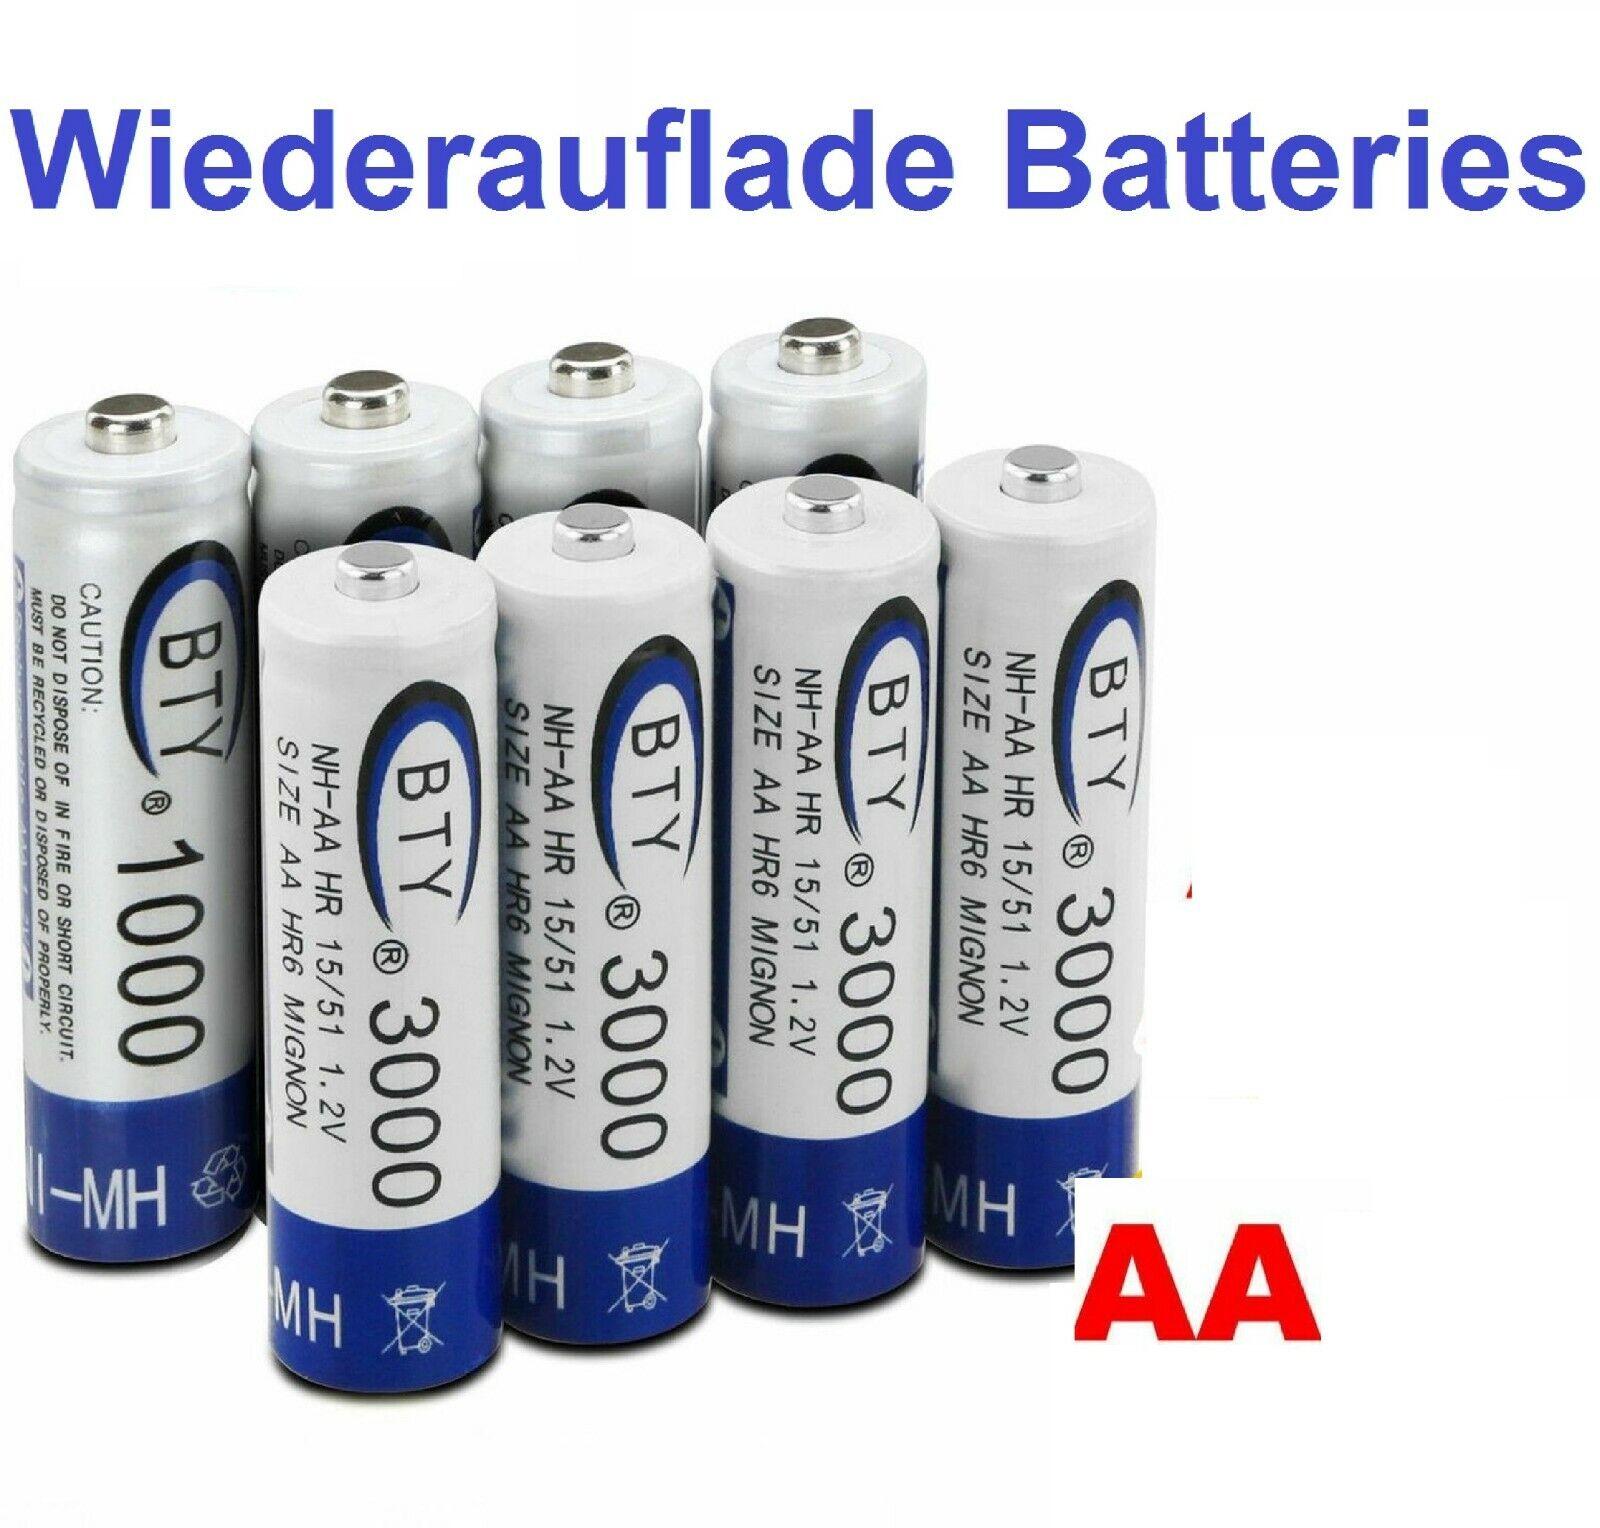 Wiederaufladbar AA Batterie Rechargeable Akku 1.2V Battery 3000mAh Ni-MH Neu